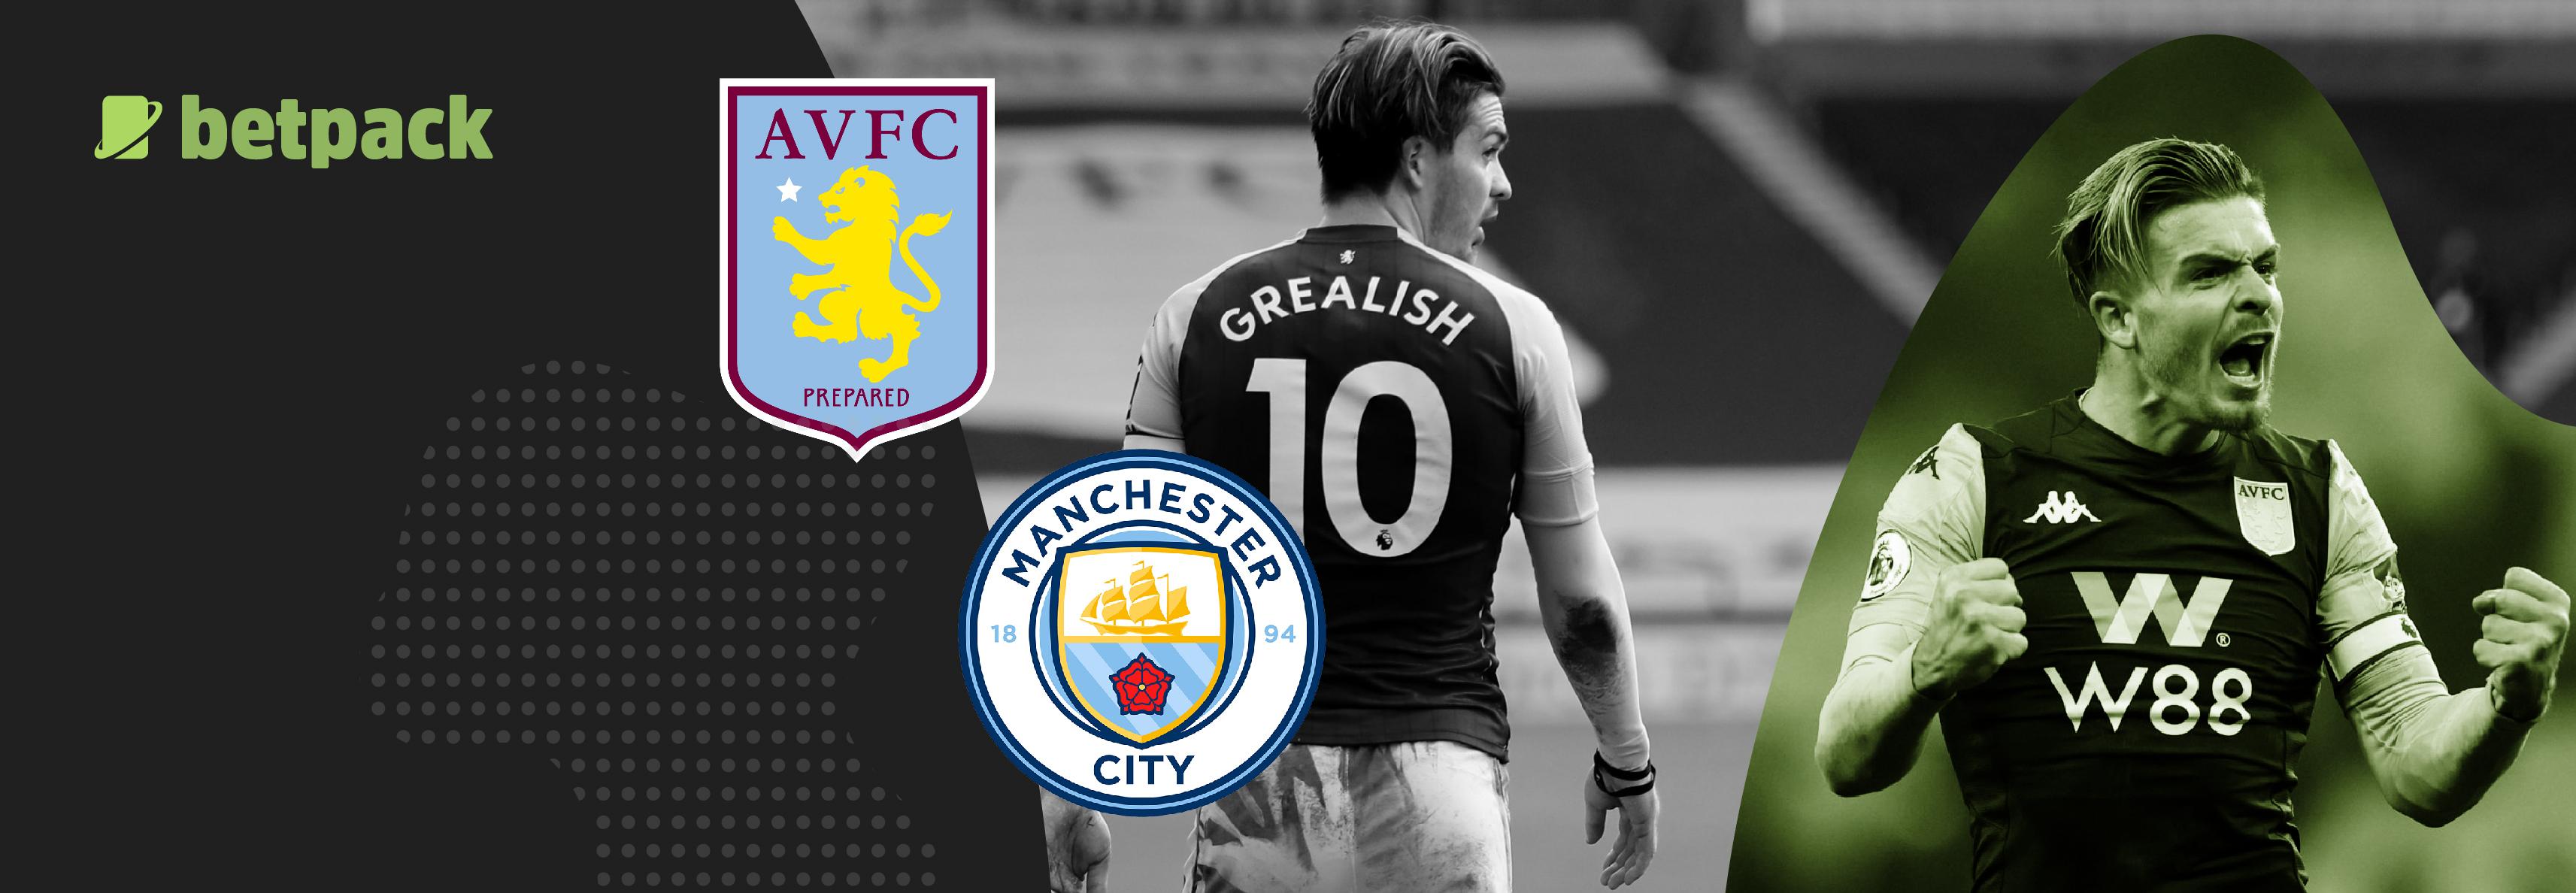 Villa will offer Grealish a new deal worth £200,000 per week